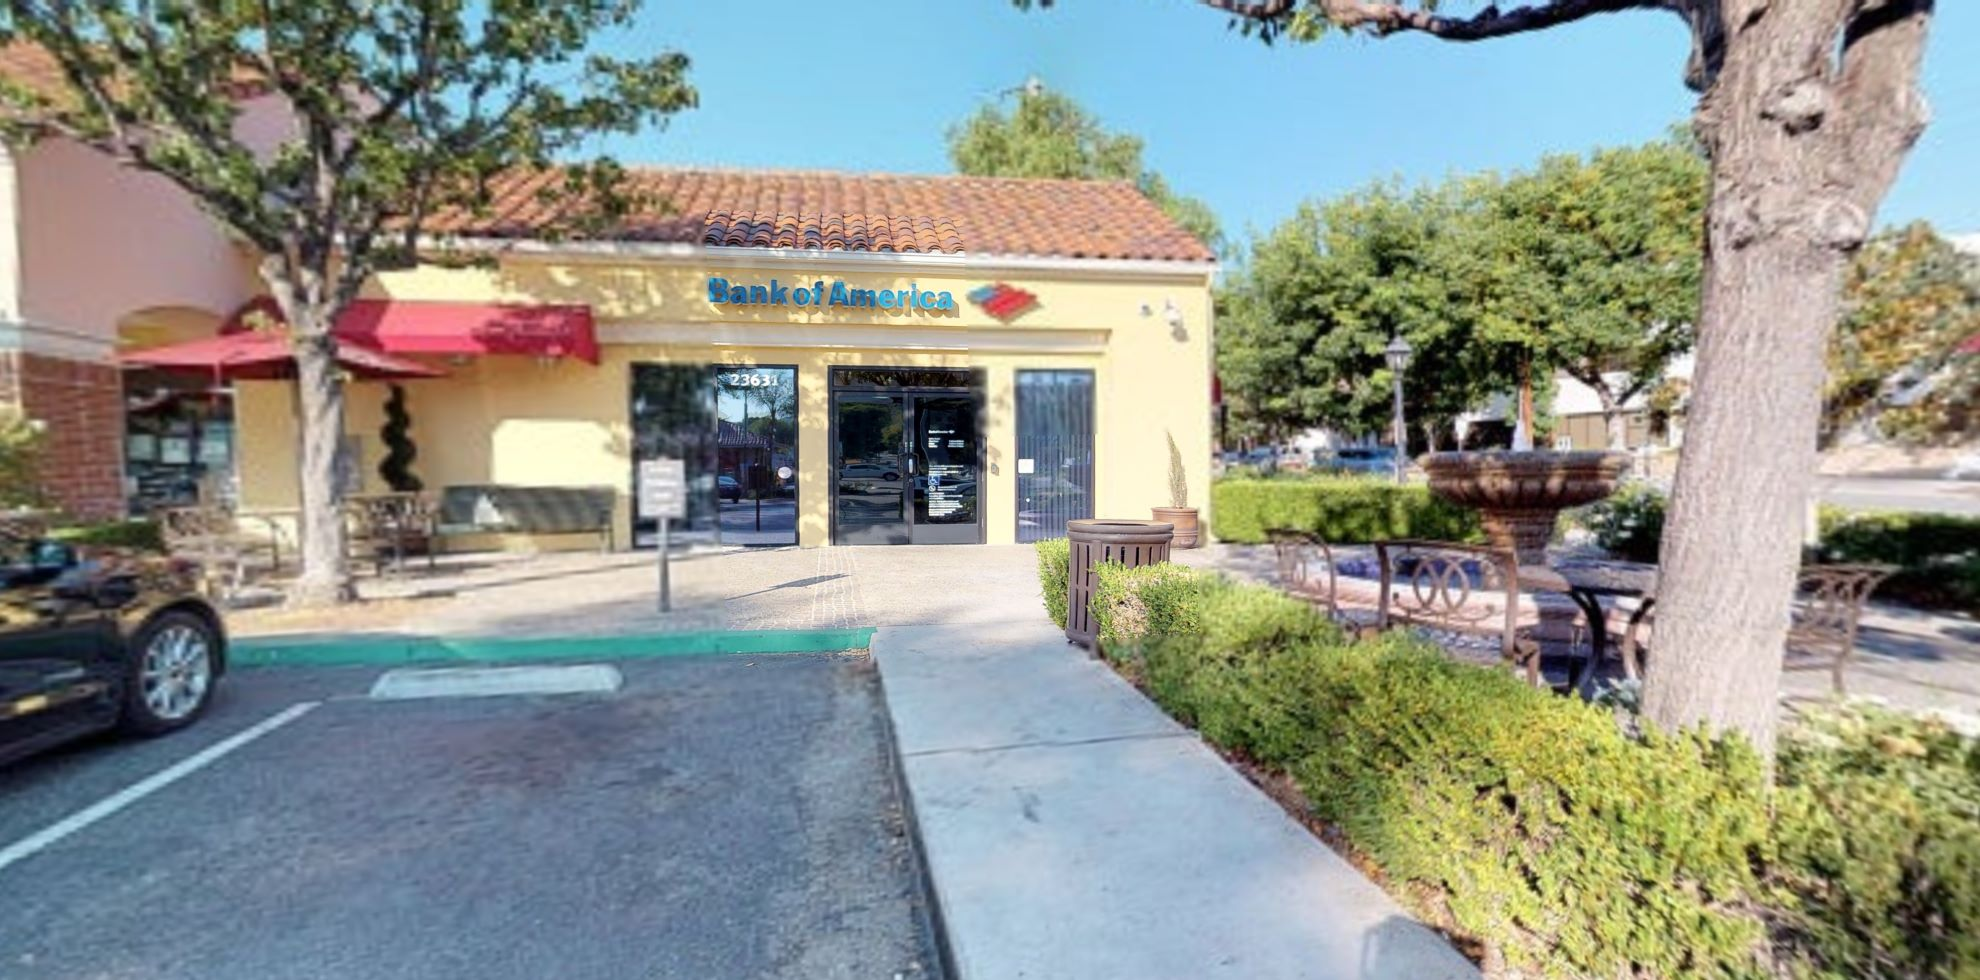 Bank of America financial center with walk-up ATM   23631 Calabasas Rd, Calabasas, CA 91302